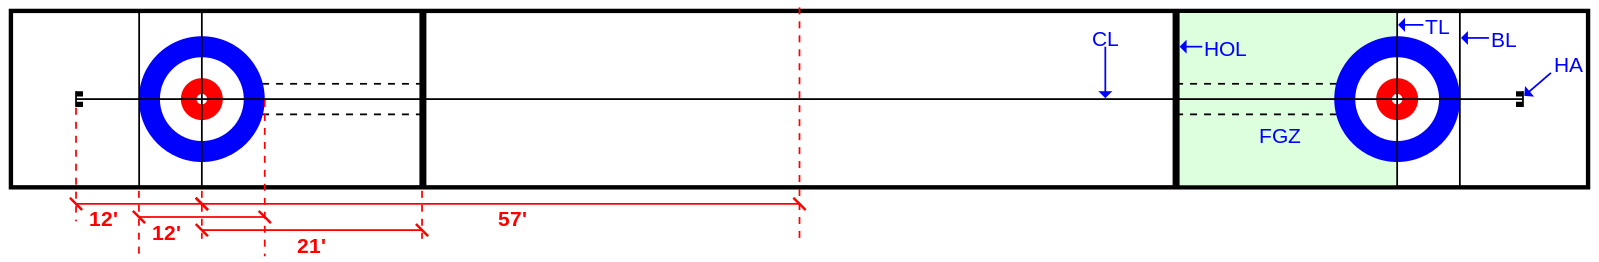 Curling sheet two